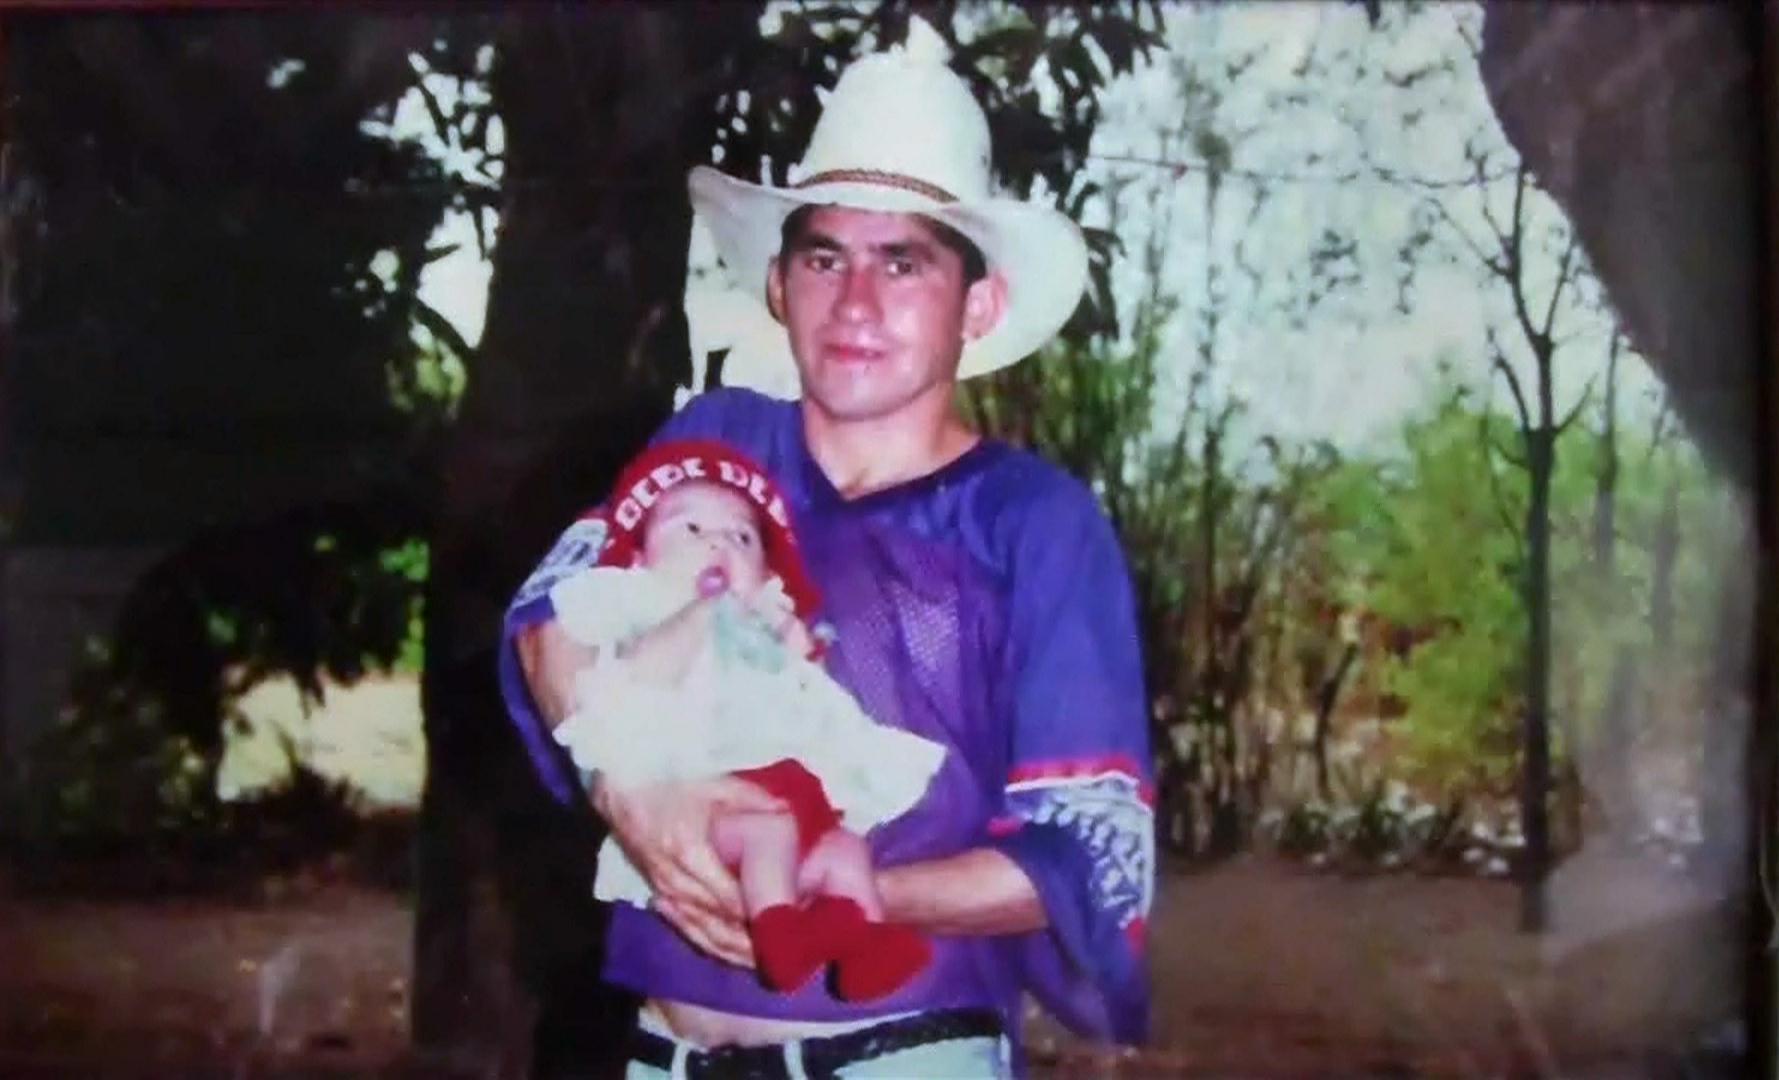 Image: Jose Salvador Alvarenga the castaway holding his daughter, Fatima Maeva Alvarenga, in El Salvador, when she was a baby.